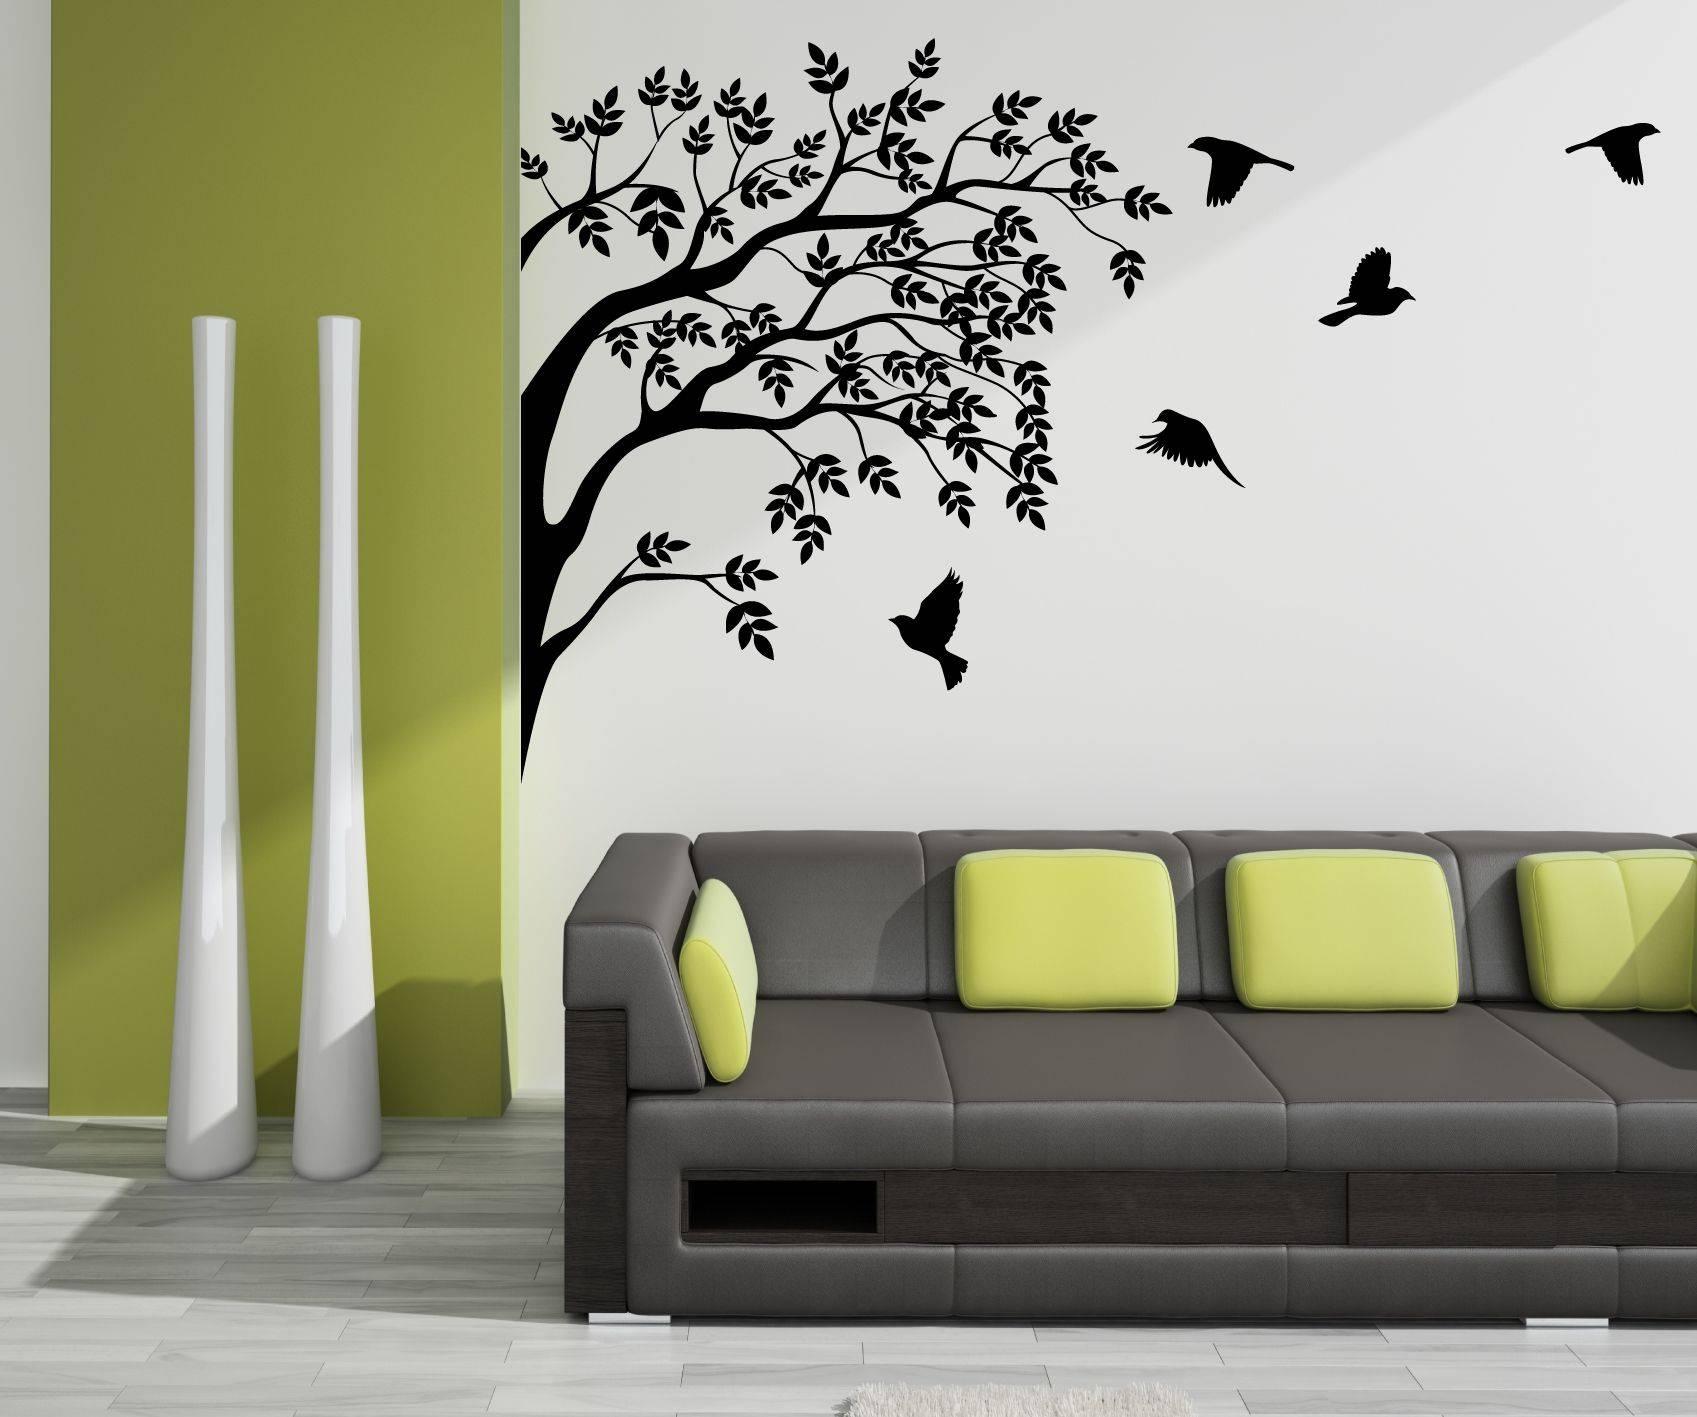 Wall Art Designs: Vinyl Wall Art Flock Of Birds In A Tree Vinyl Throughout Newest Vinyl Wall Art Tree (View 20 of 20)